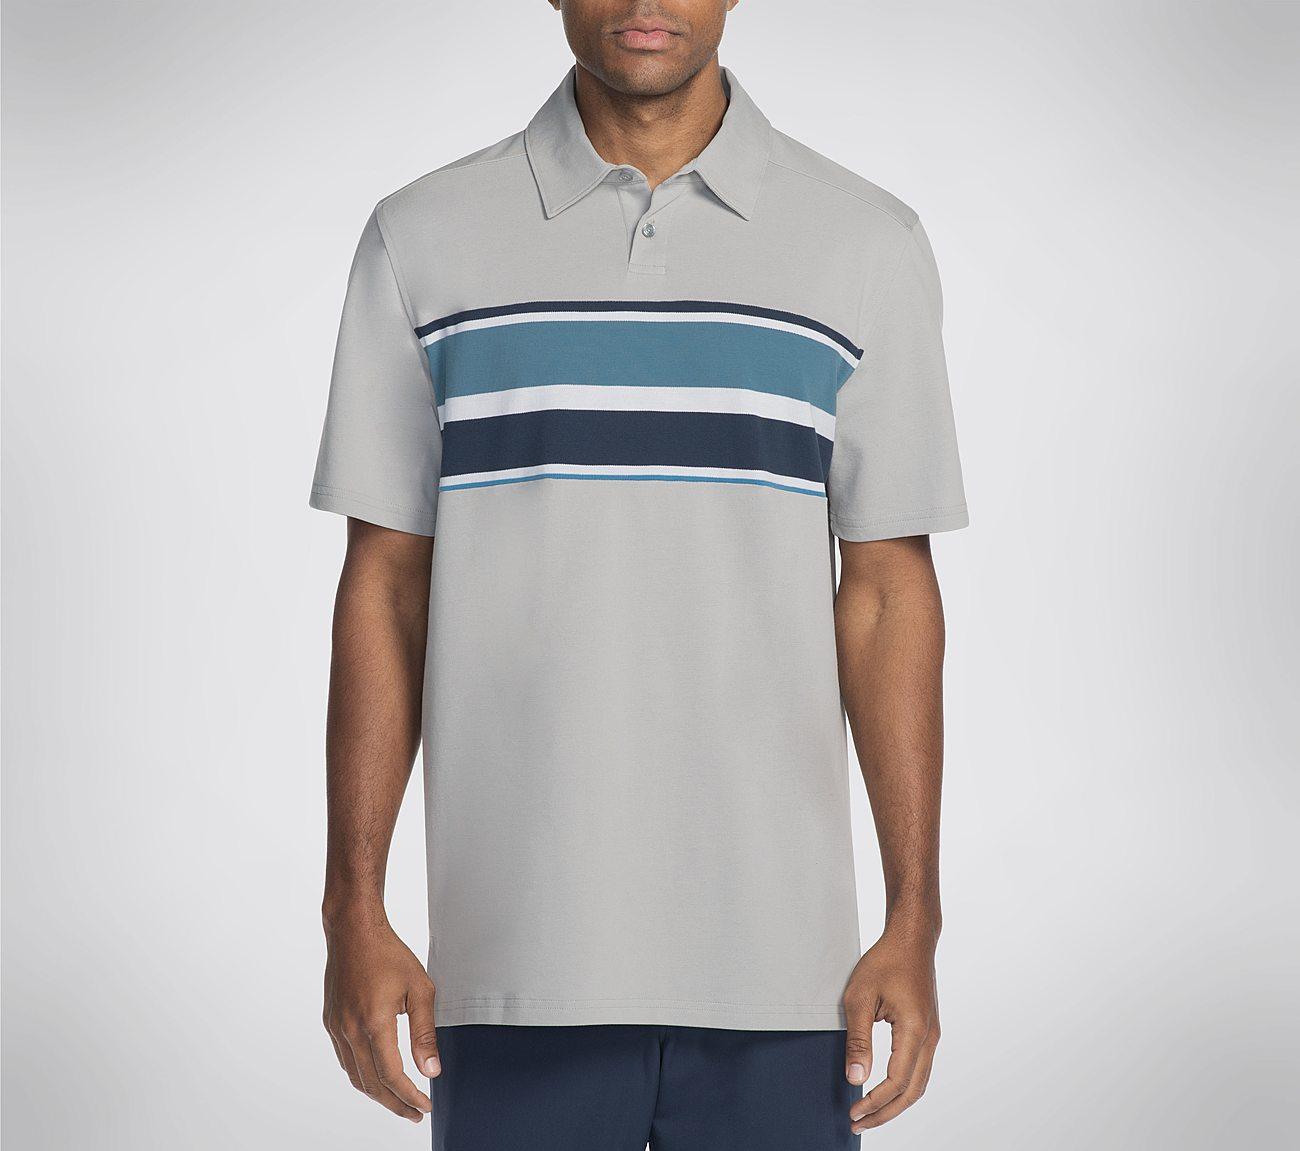 Skechers GO GOLF Fade Engineered Stripe Polo Shirt